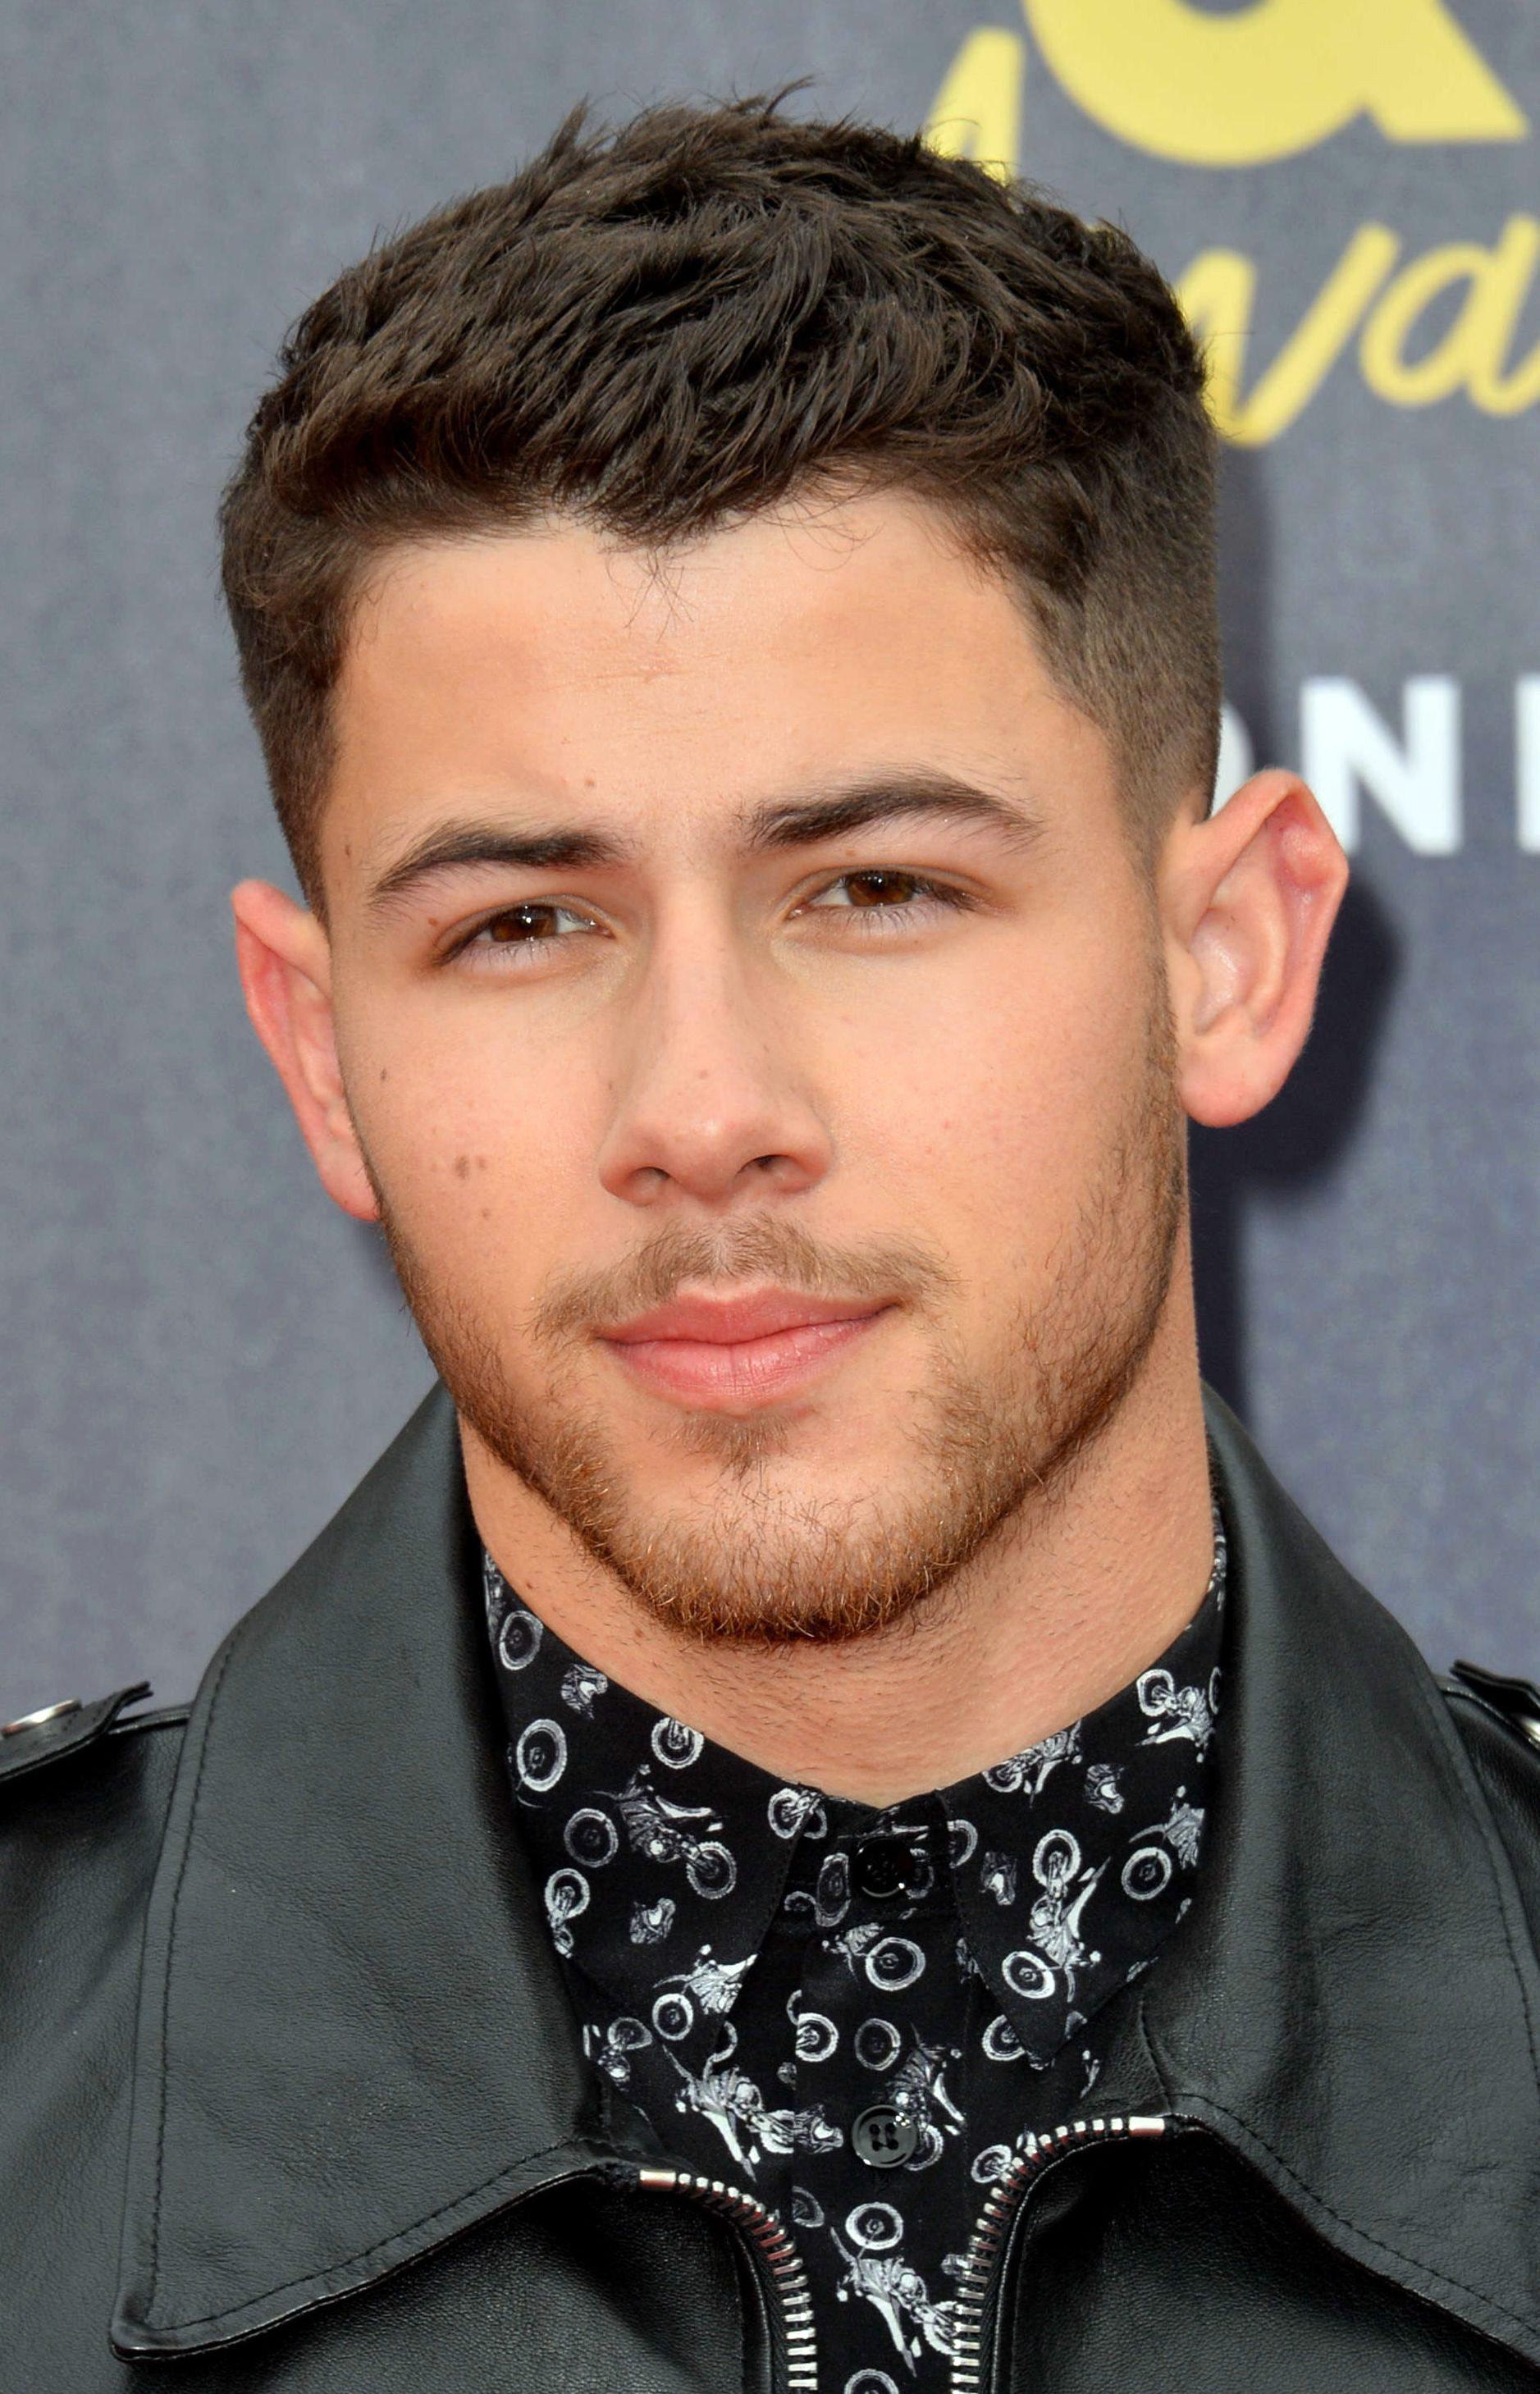 Nick Jonas's Clean Undercut